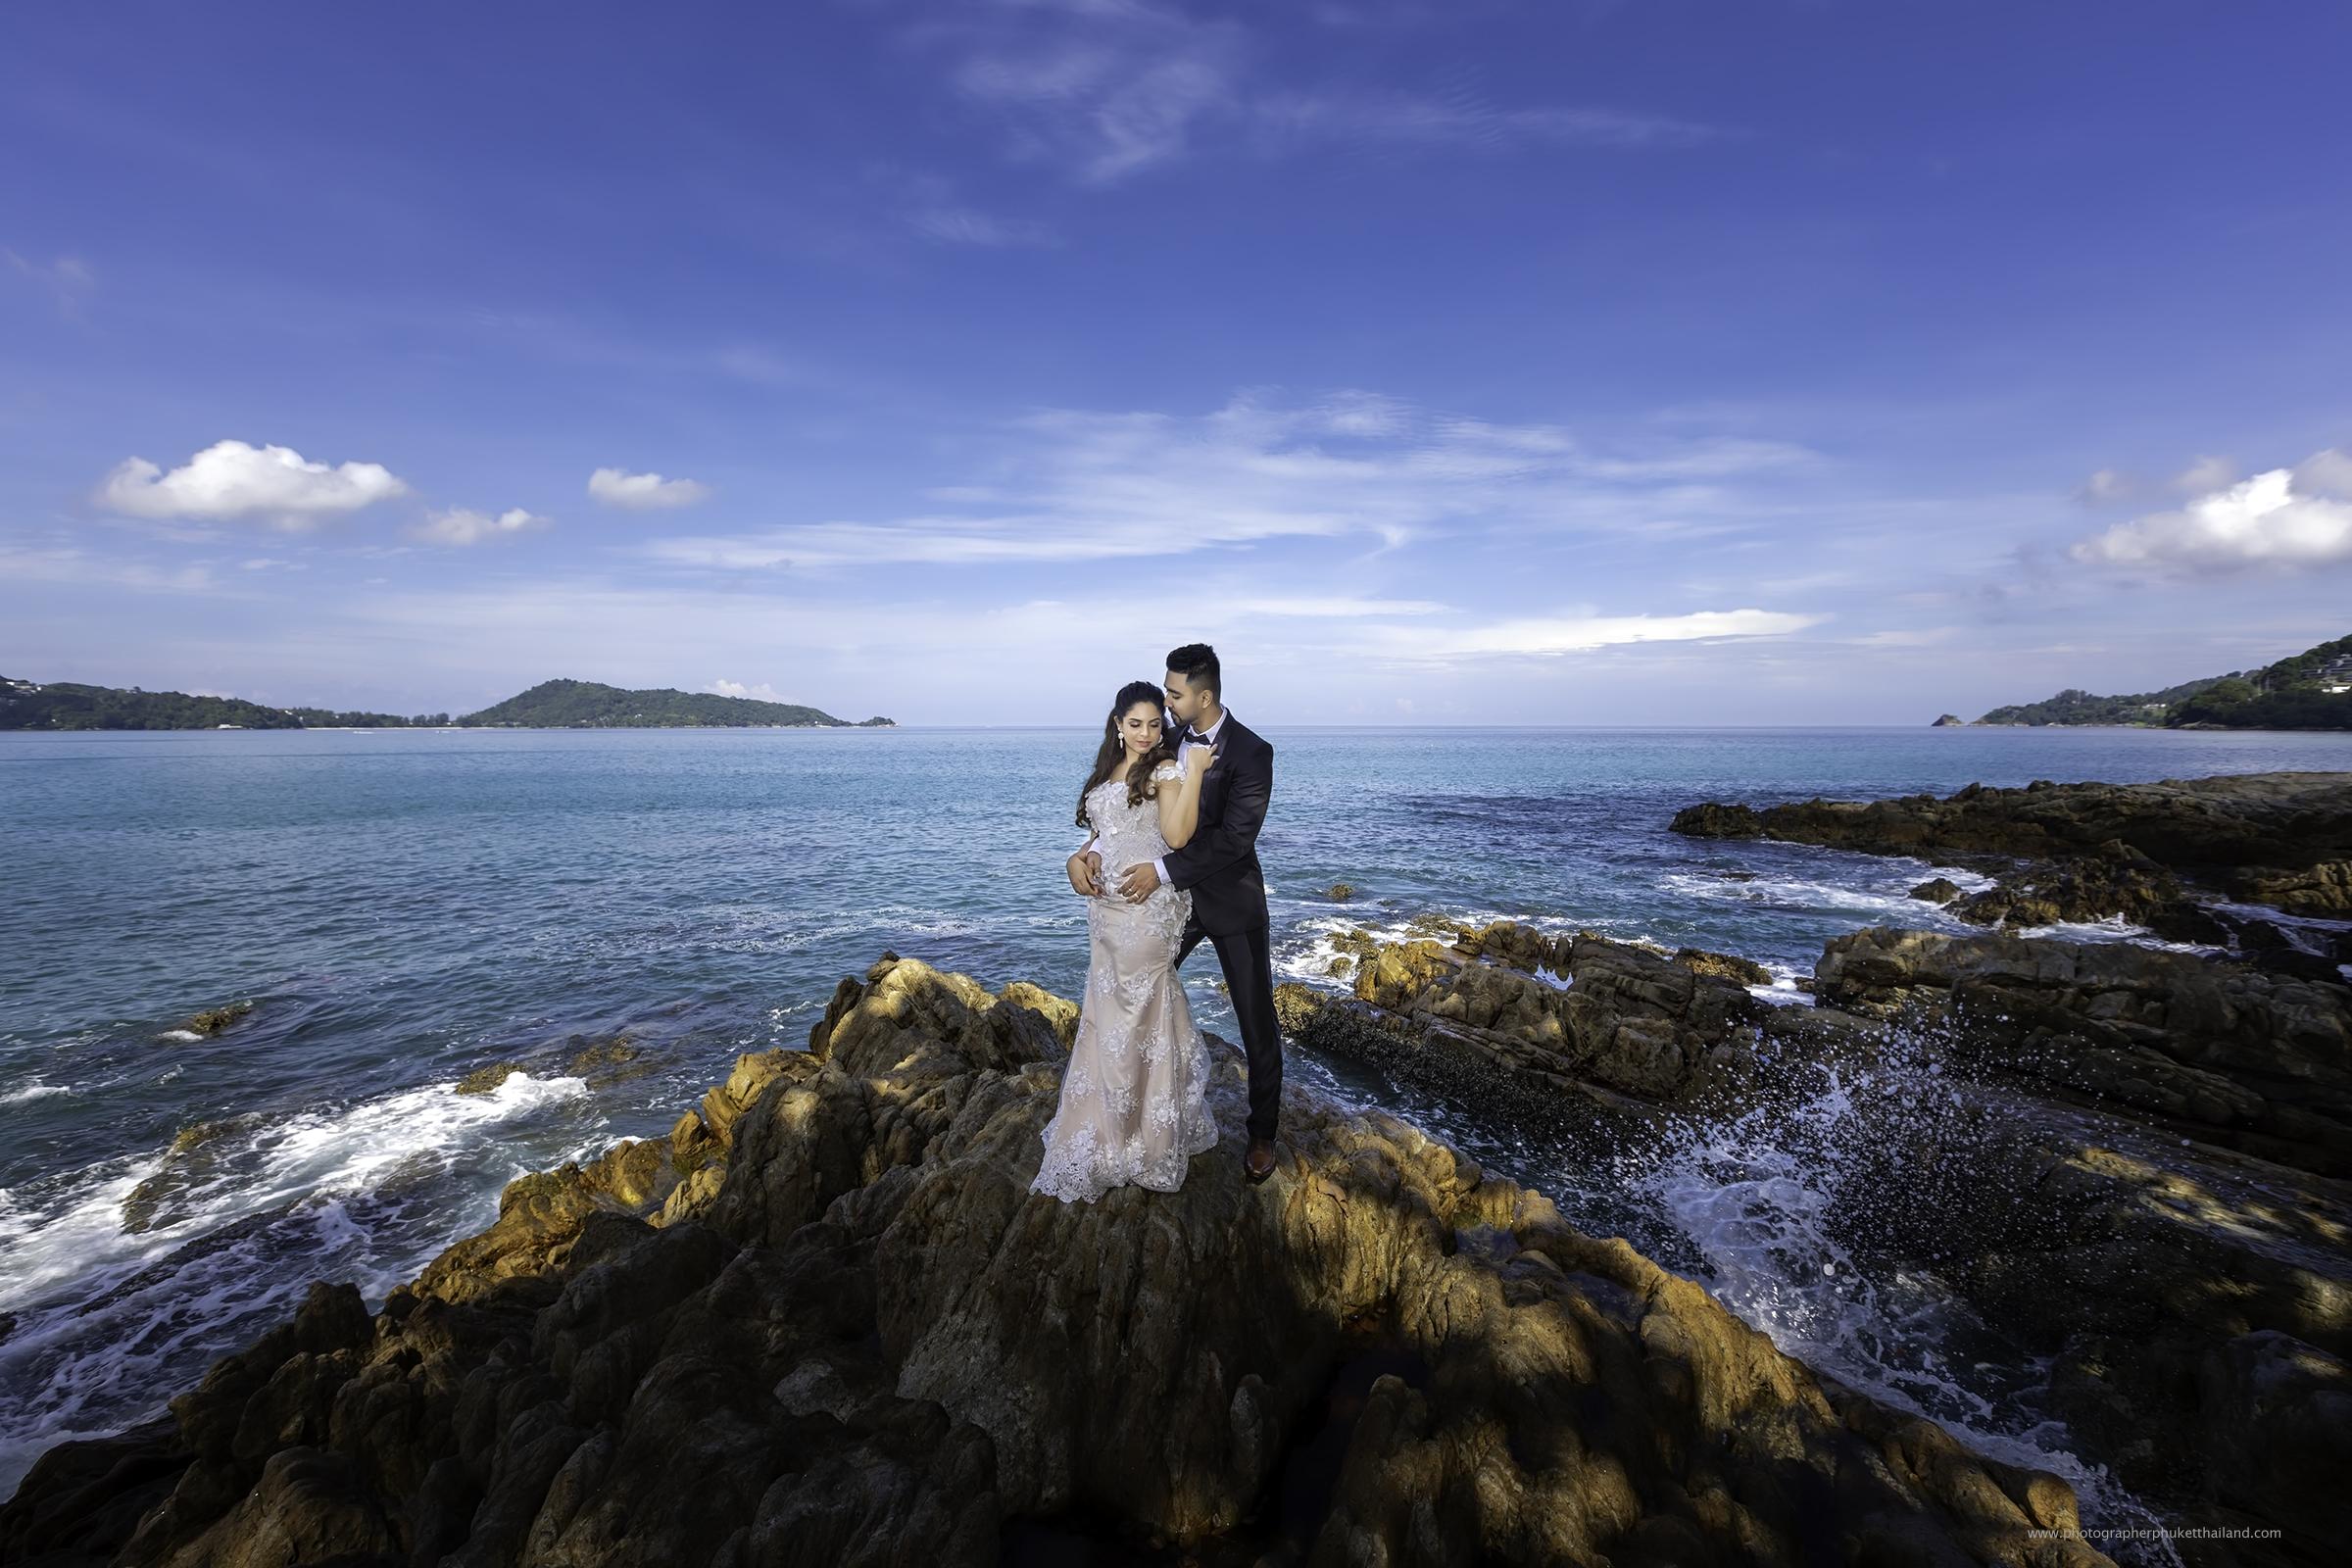 pre wedding photoshoot at kalim beach phuket by photographerphuketthailand